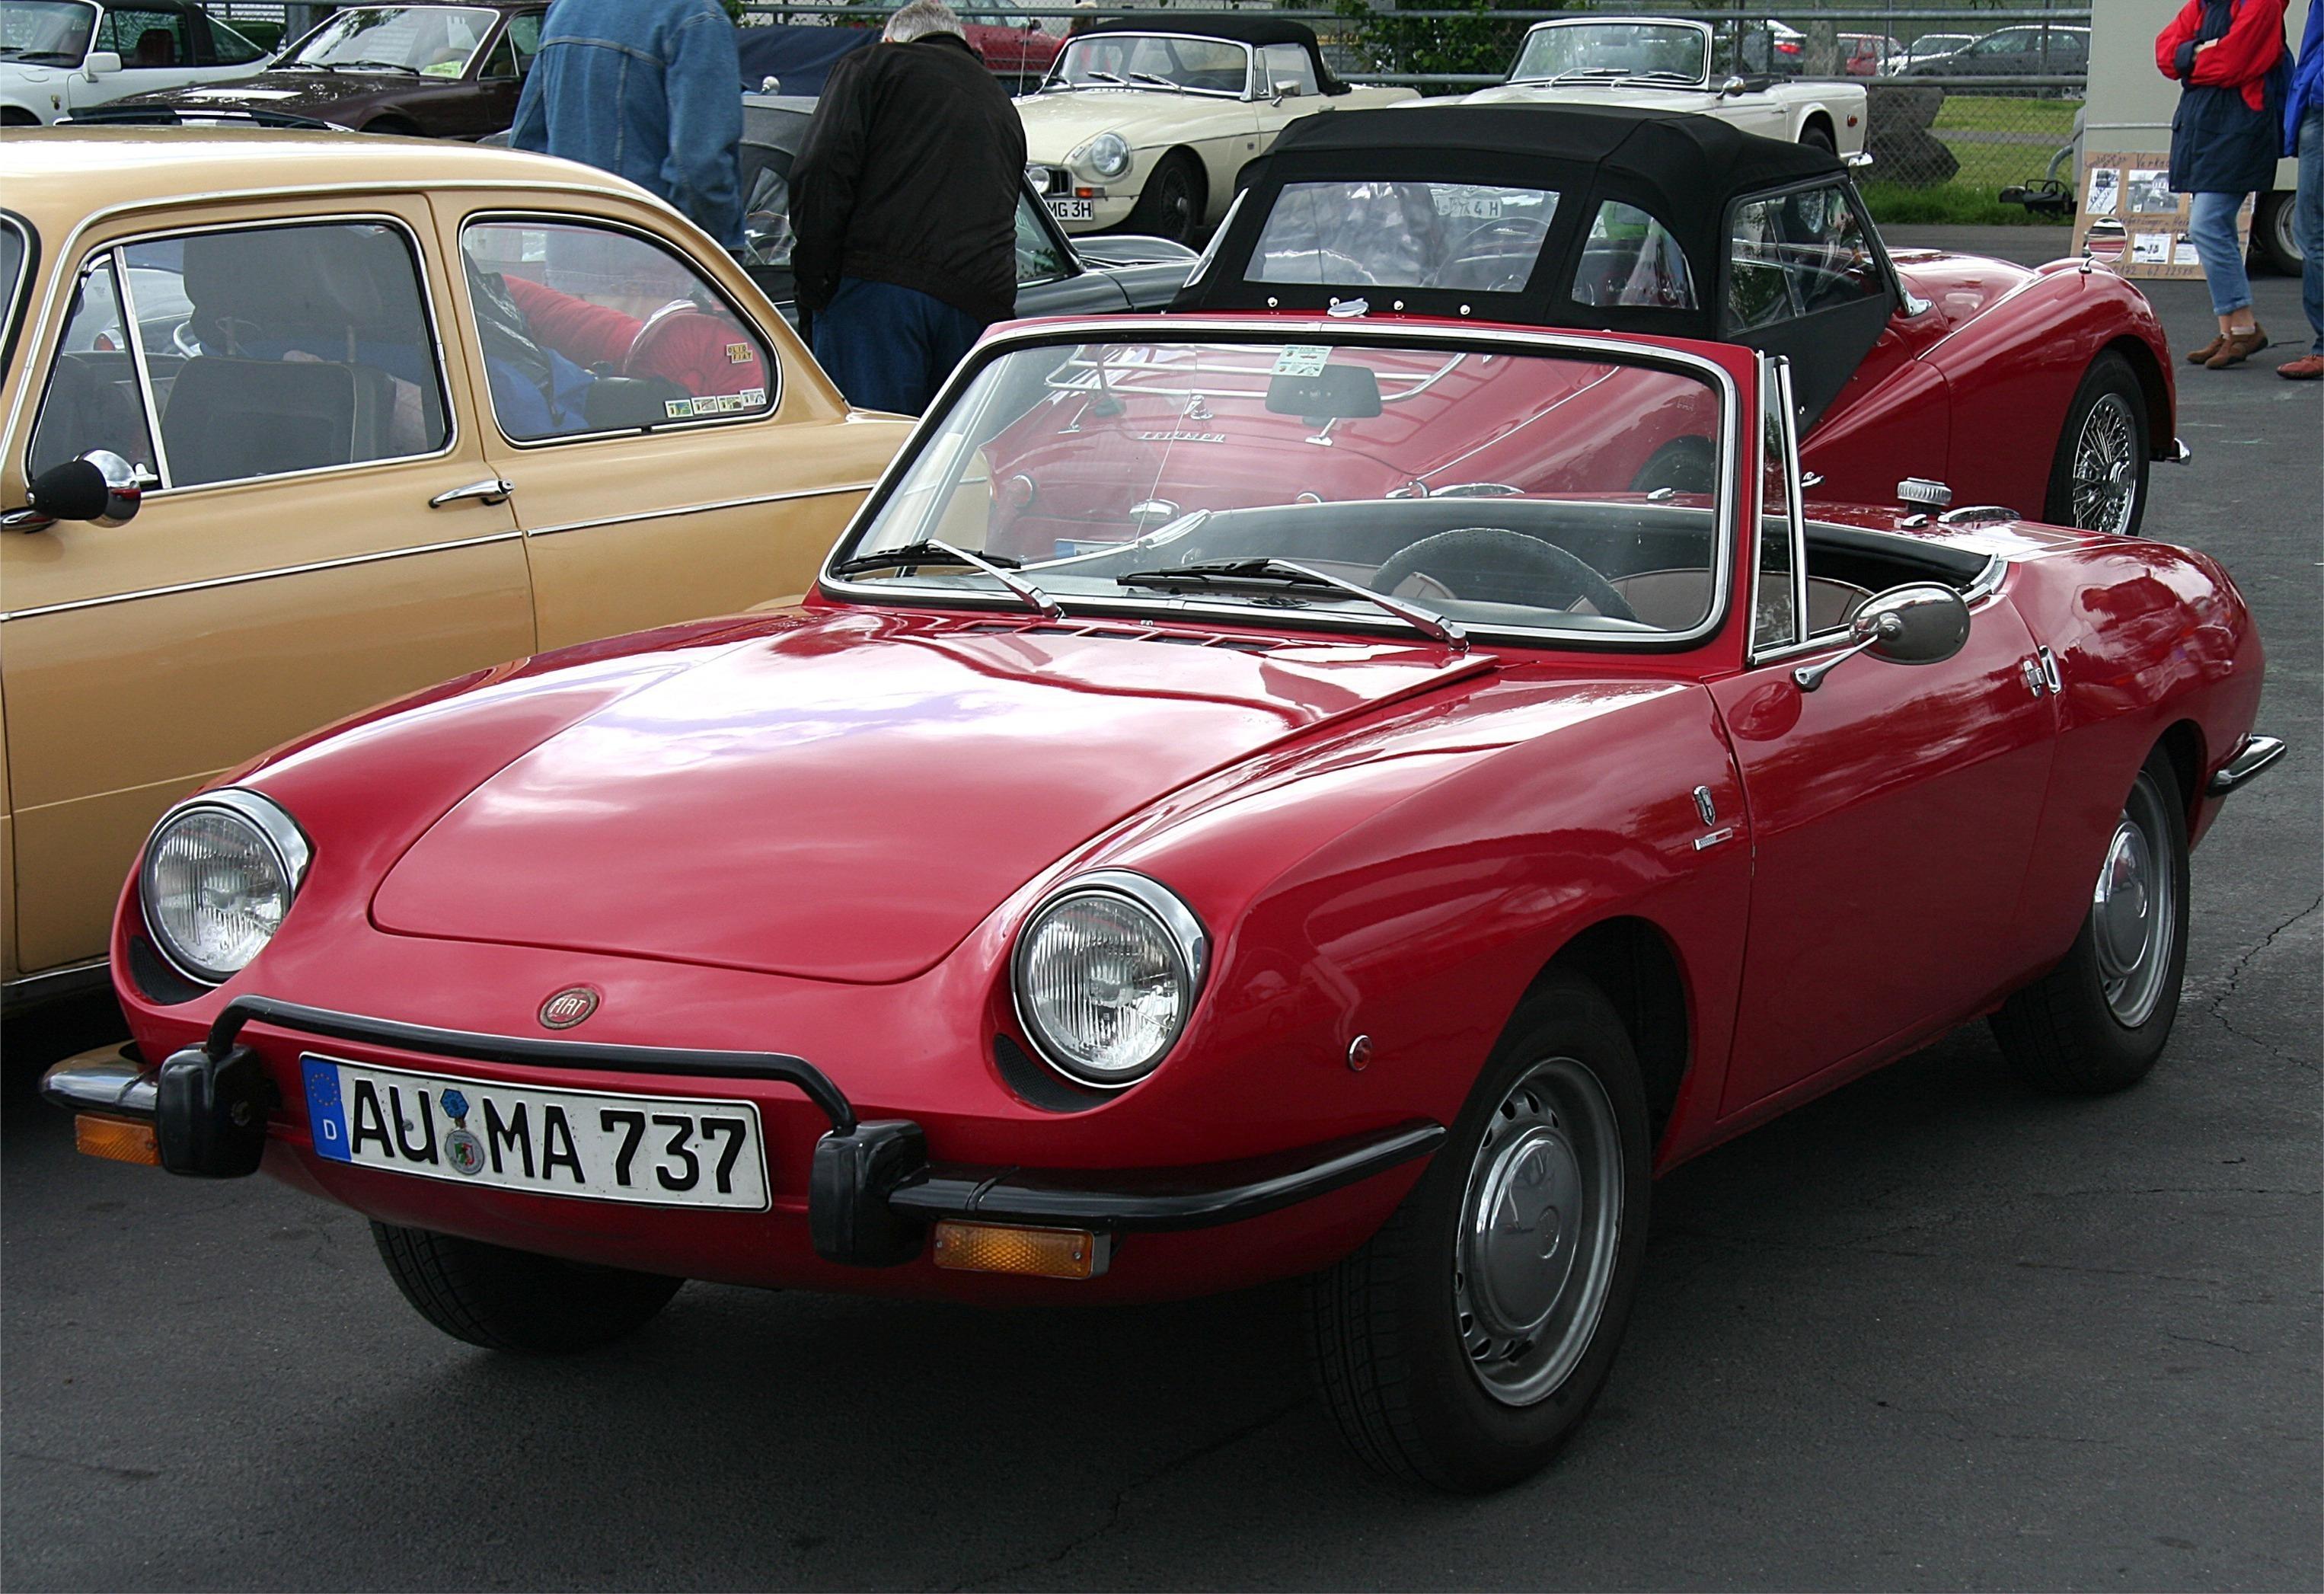 File:Fiat 850 Spider (16.06.2007).jpg - Wikimedia Commons